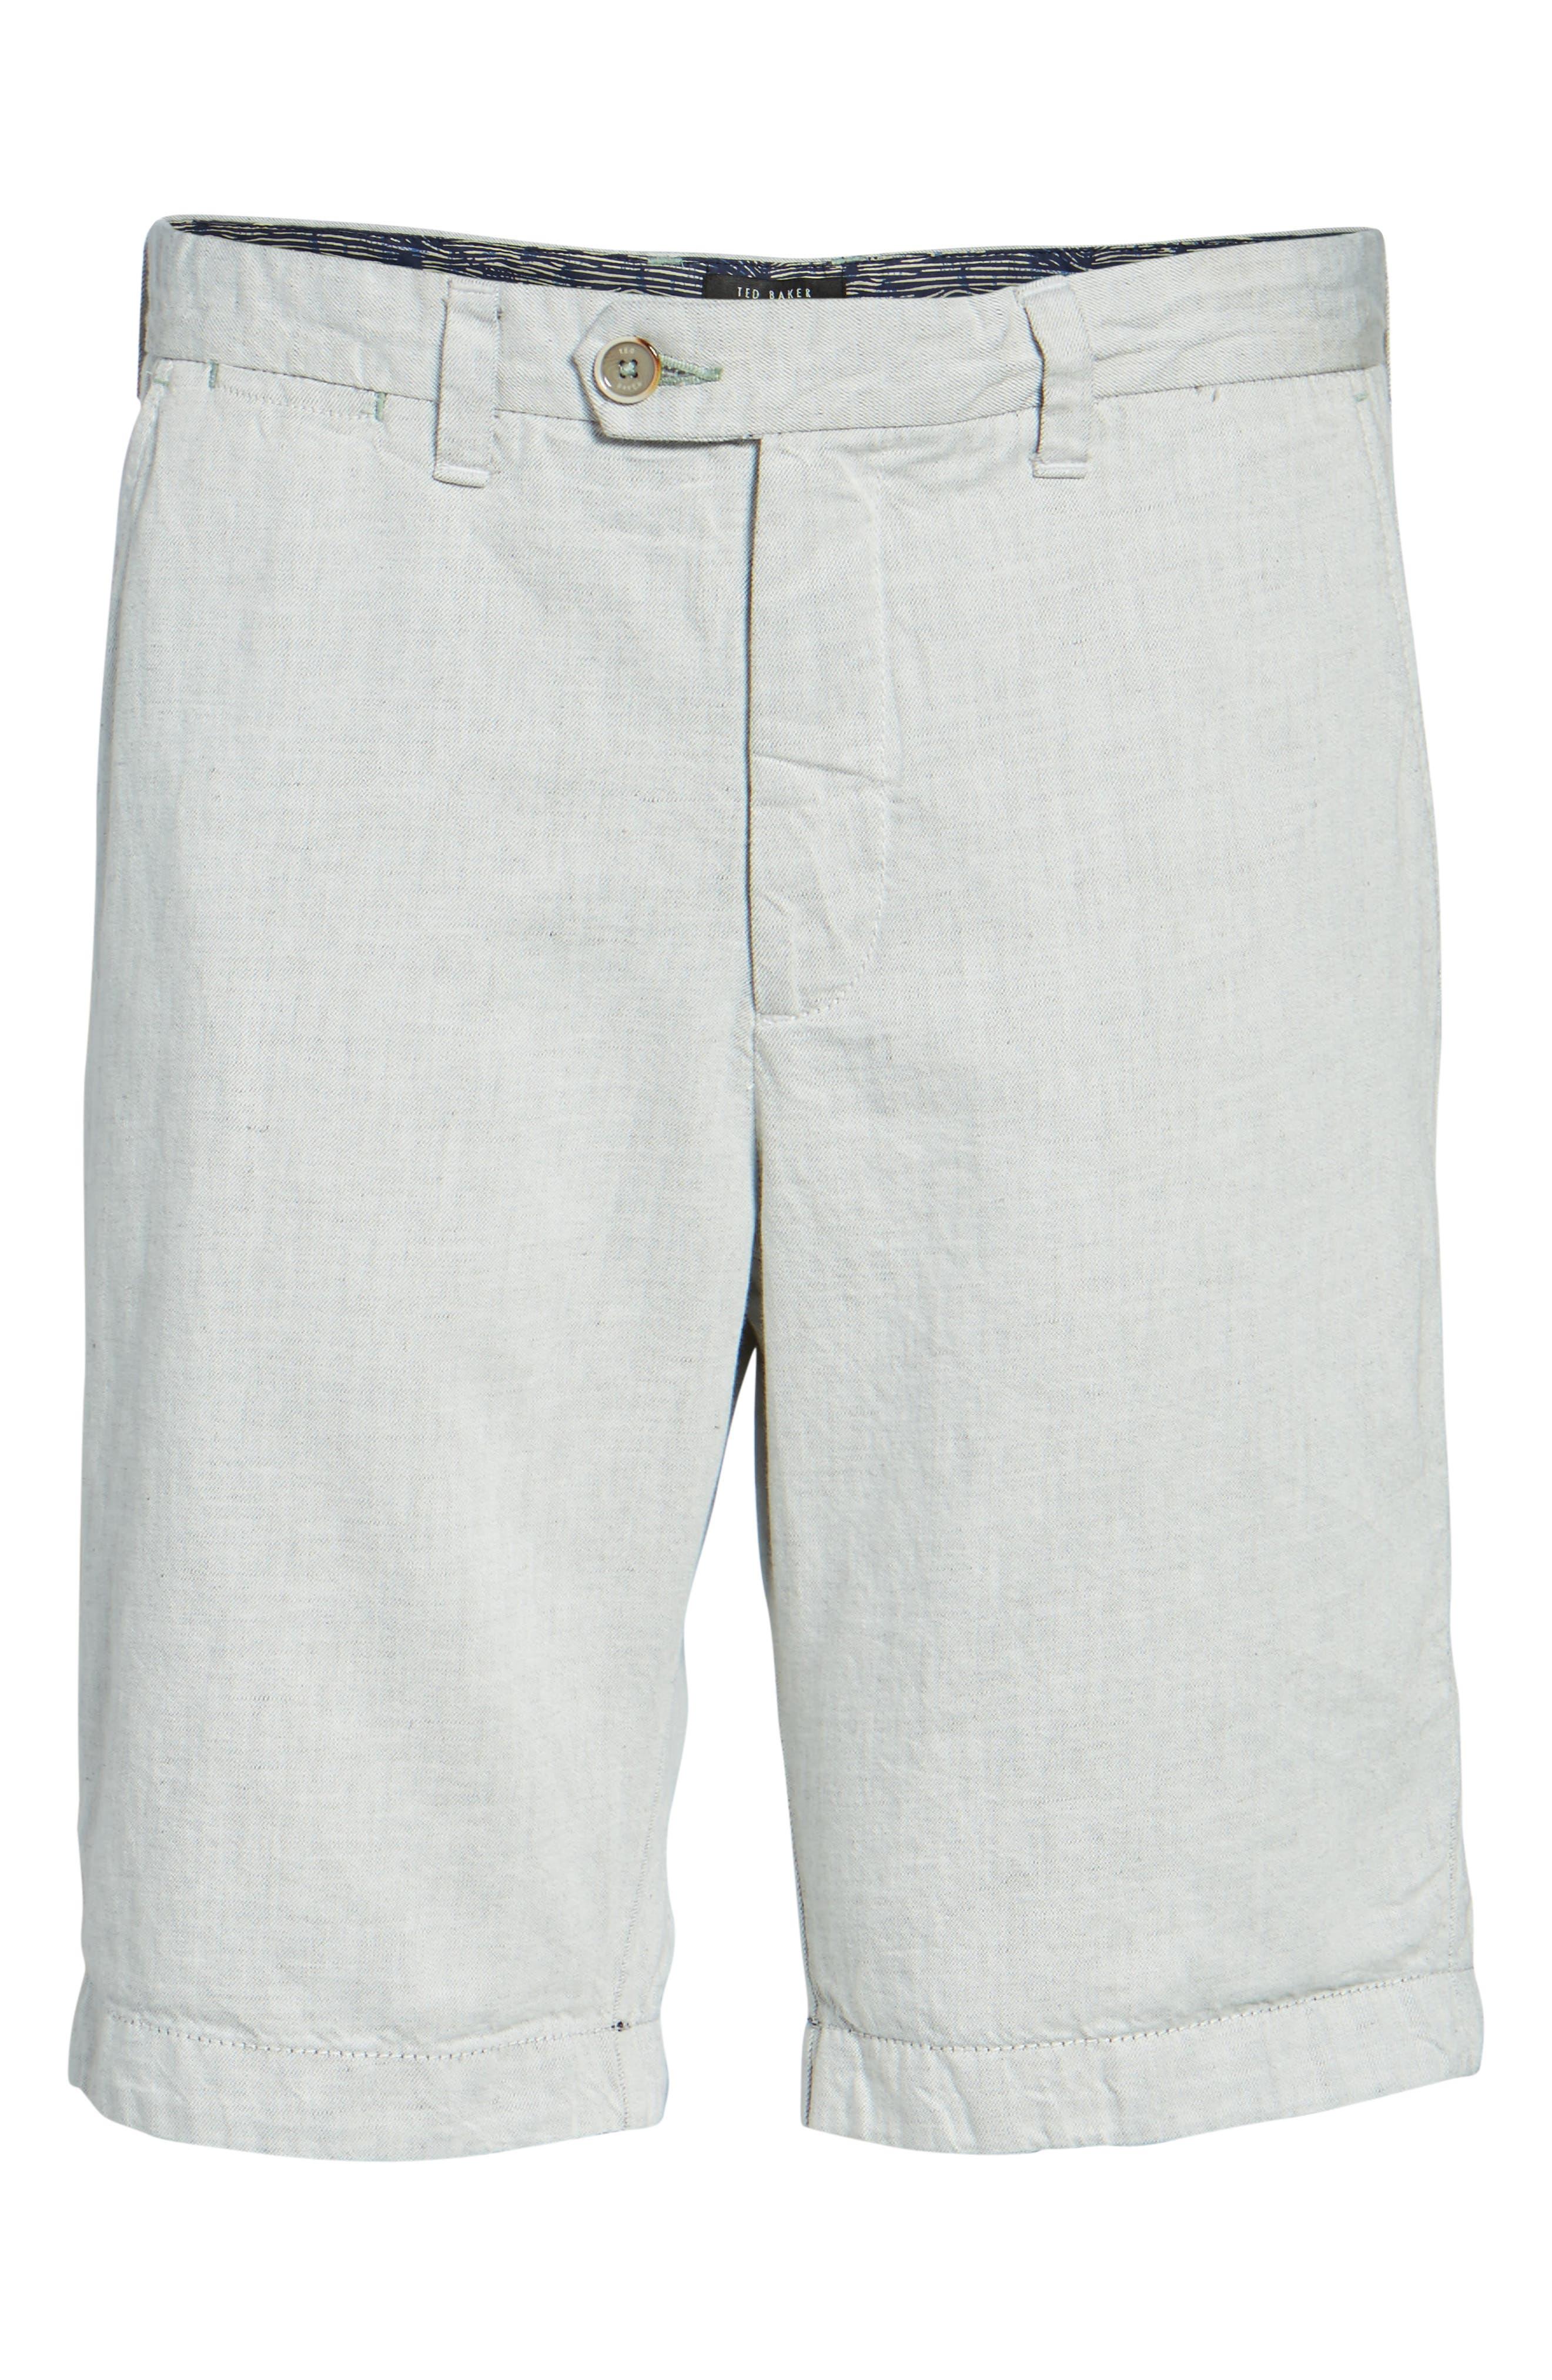 Frisho Cuff Denim Shorts,                             Alternate thumbnail 4, color,                             Light Grey